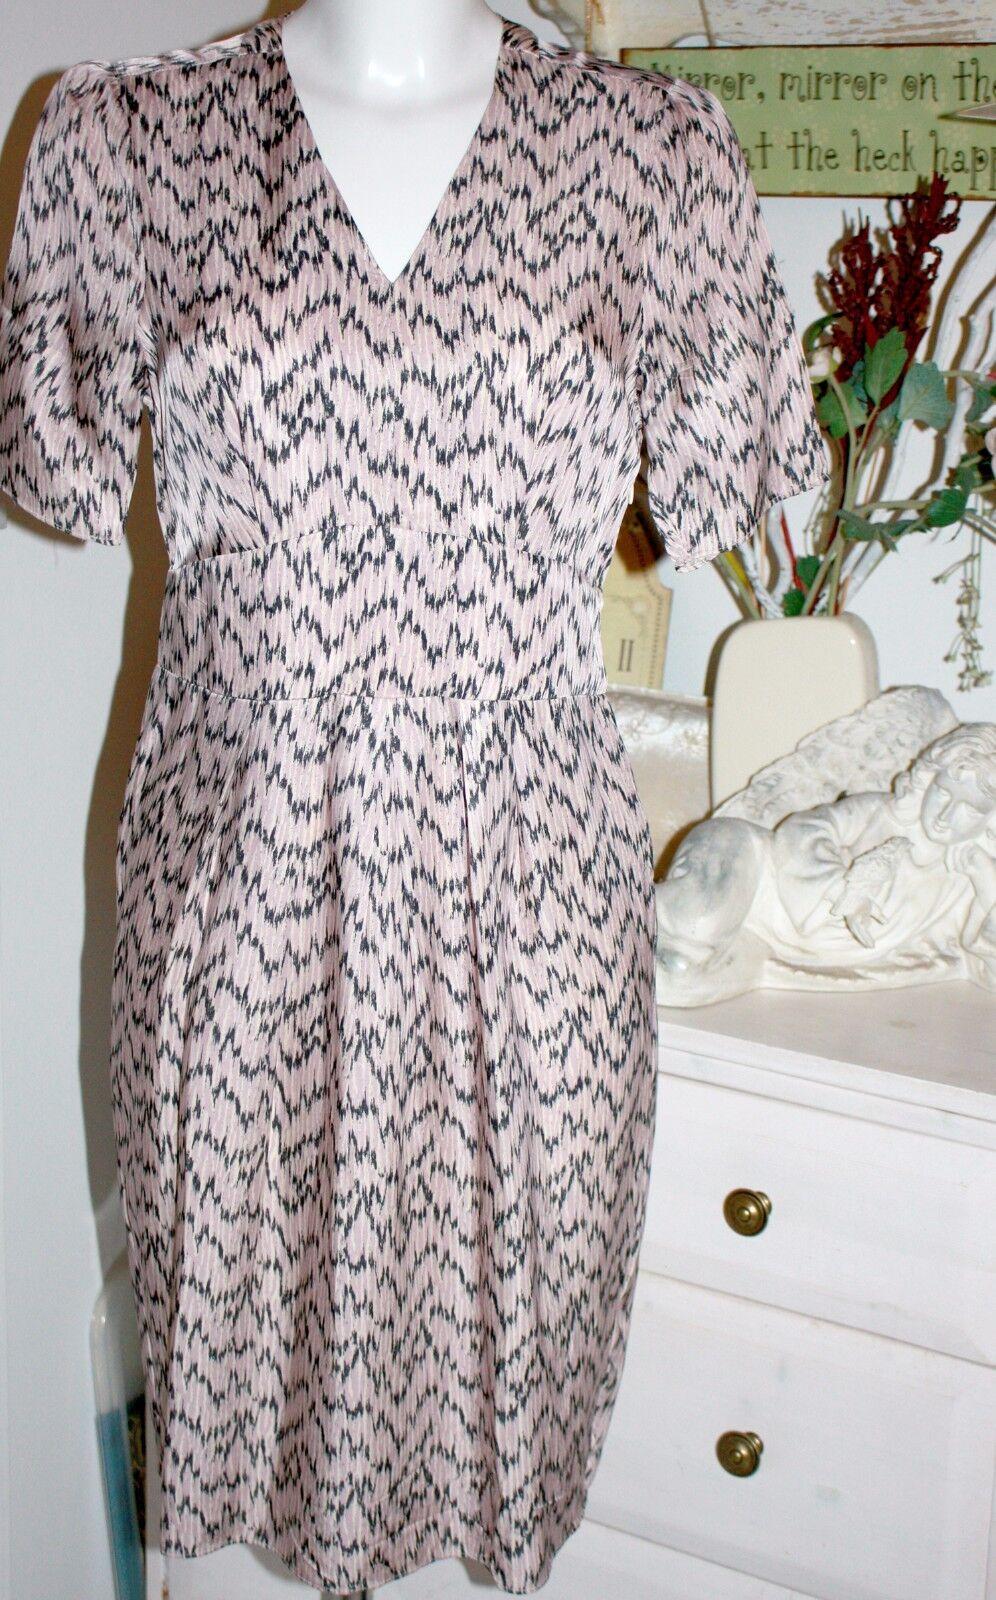 Noa Noa Kleid Dress Printed Cupro Print lila  Kurzarm Größe  S 36  Neu